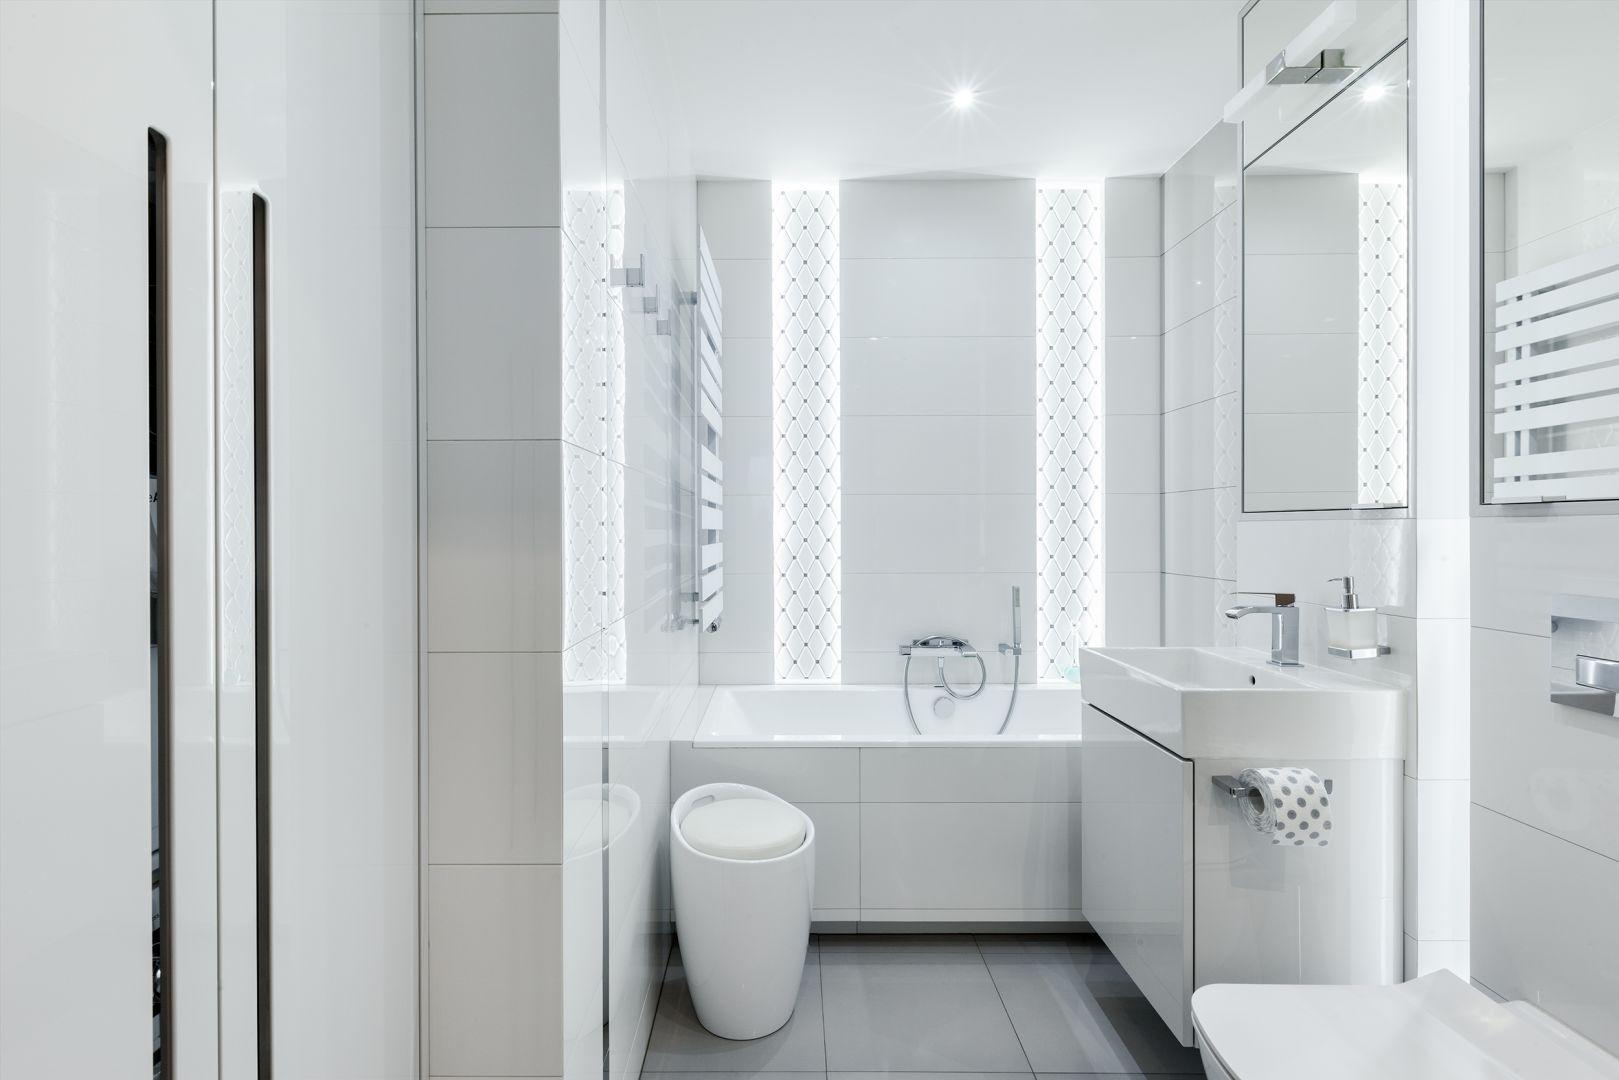 Biała łazienka w stylu total look. Projekt Justyna Mojżyk, poliFORMA. Fot. Monika Filipiuk-Obałek